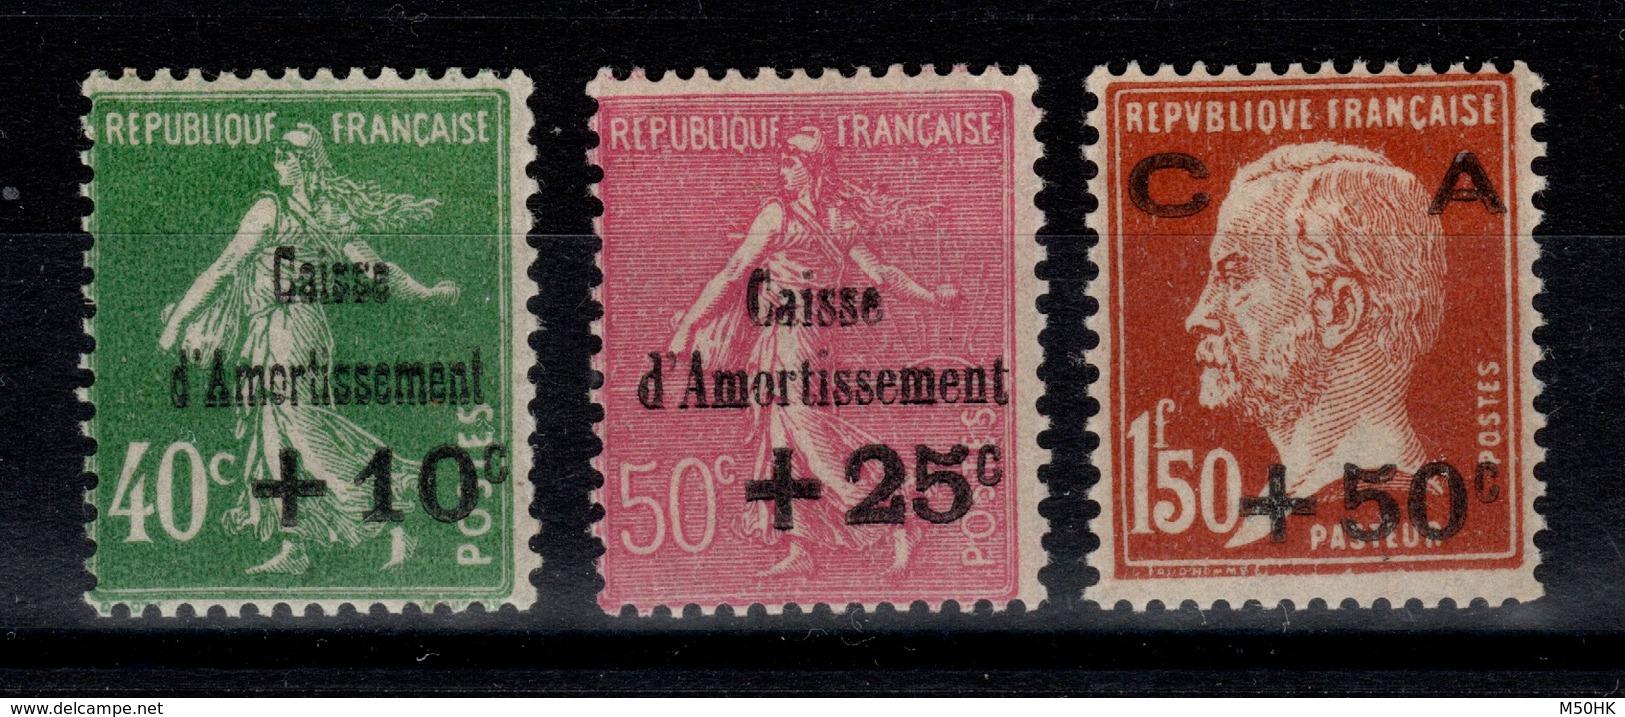 YV 253 à 255 N* Caisse Amortissement Cote 120 Euros - France